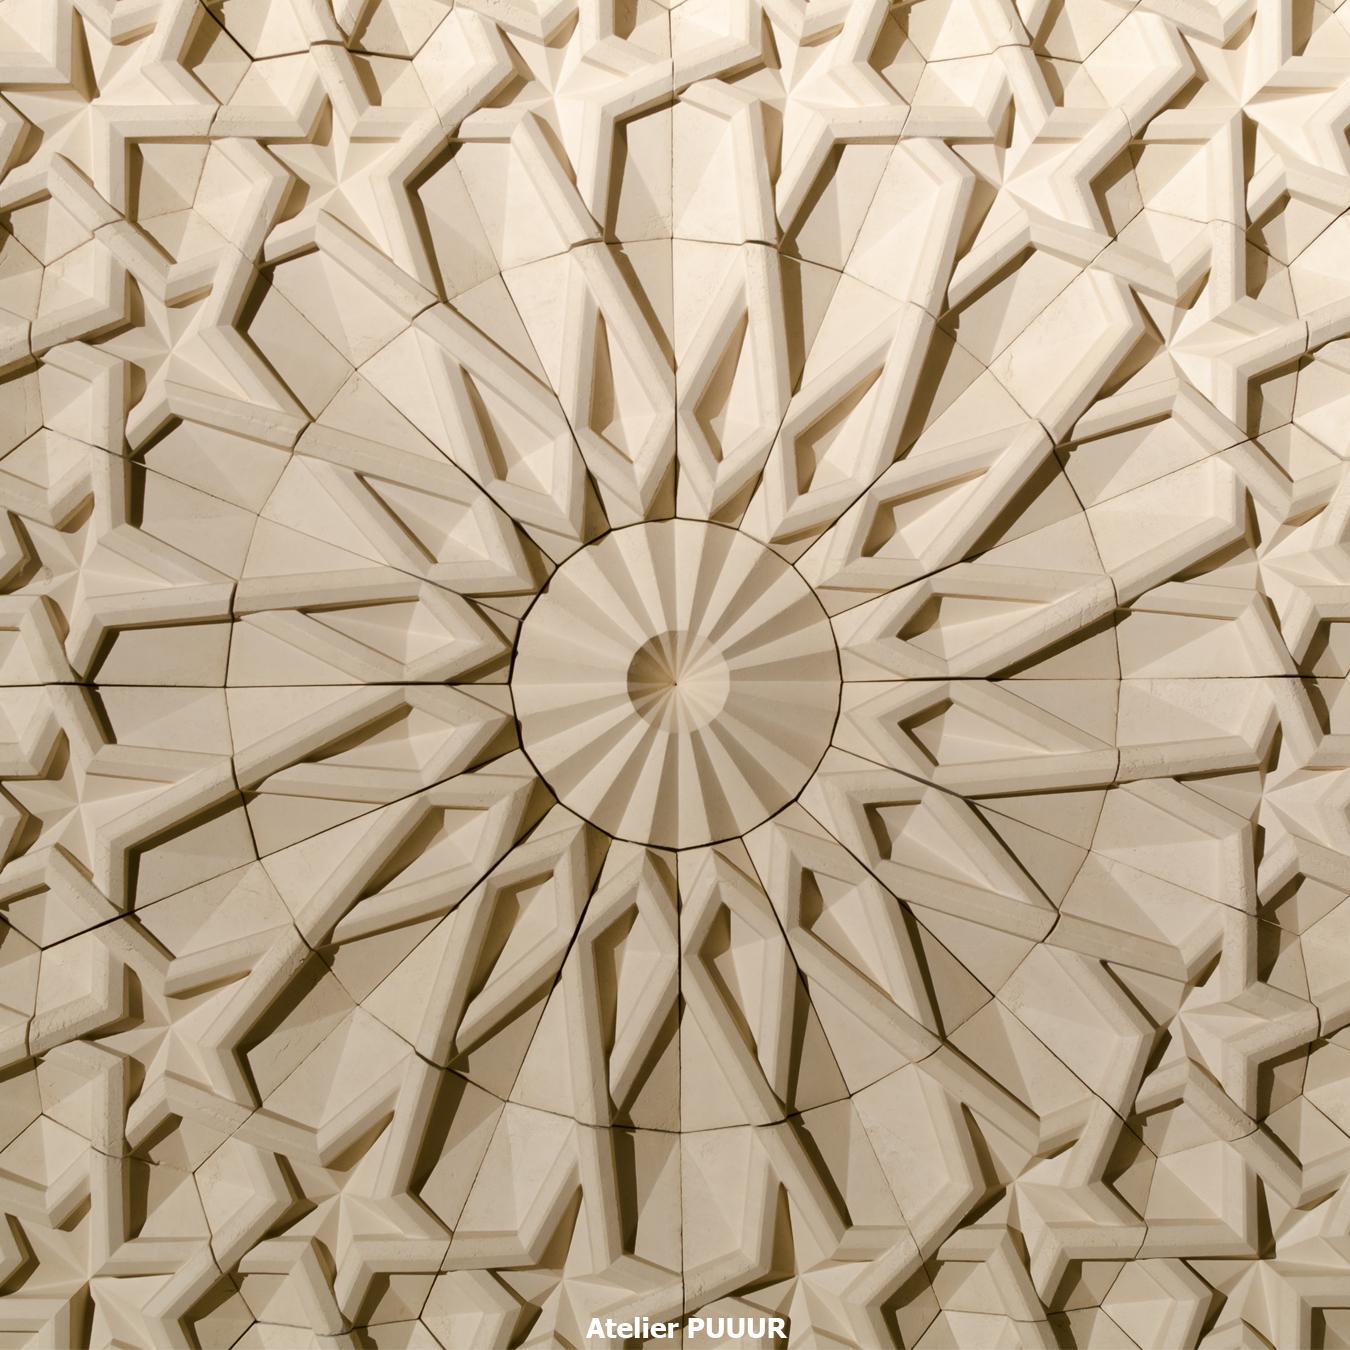 Islamic graveyard pavilion waal mosaic Atelier PUUUR